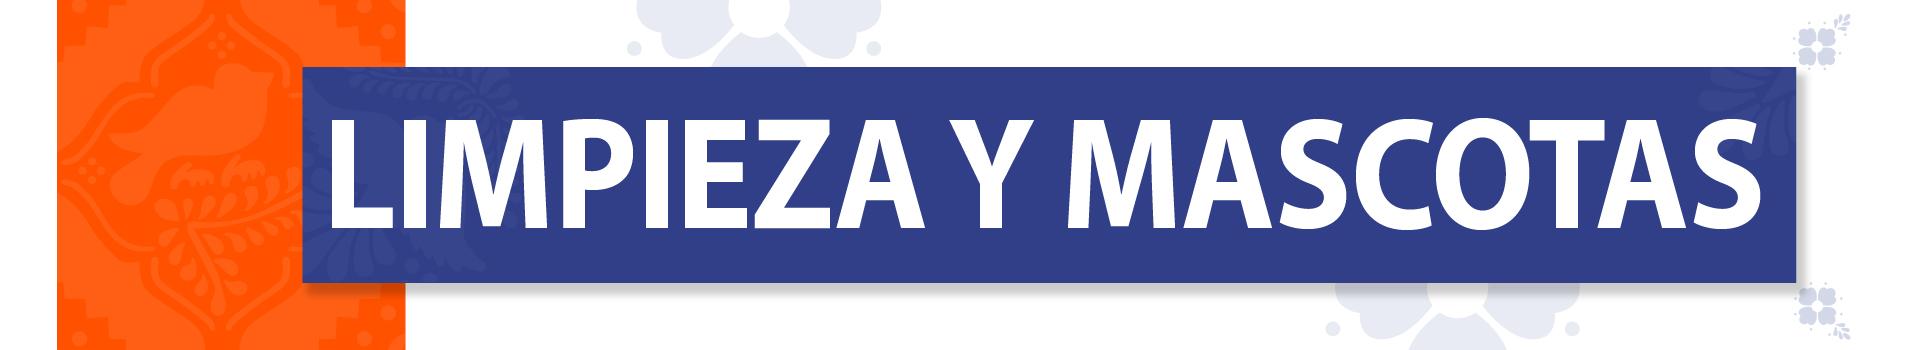 Banner Limpieza